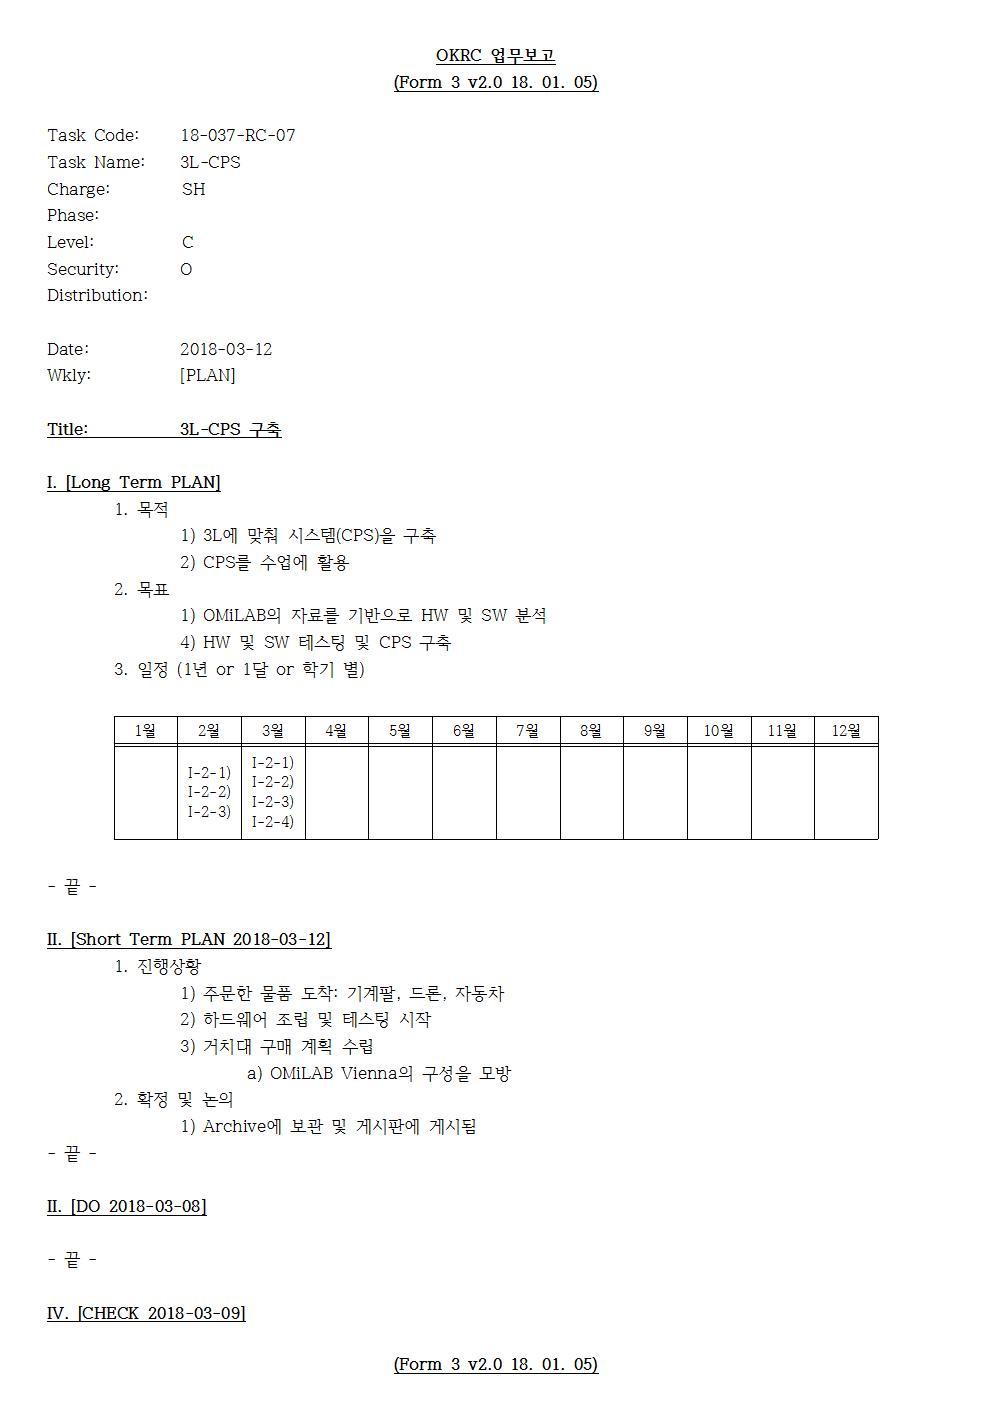 D-[18-037-RC-07]-[3L-CPS]-[2018-03-12][SH]001.jpg